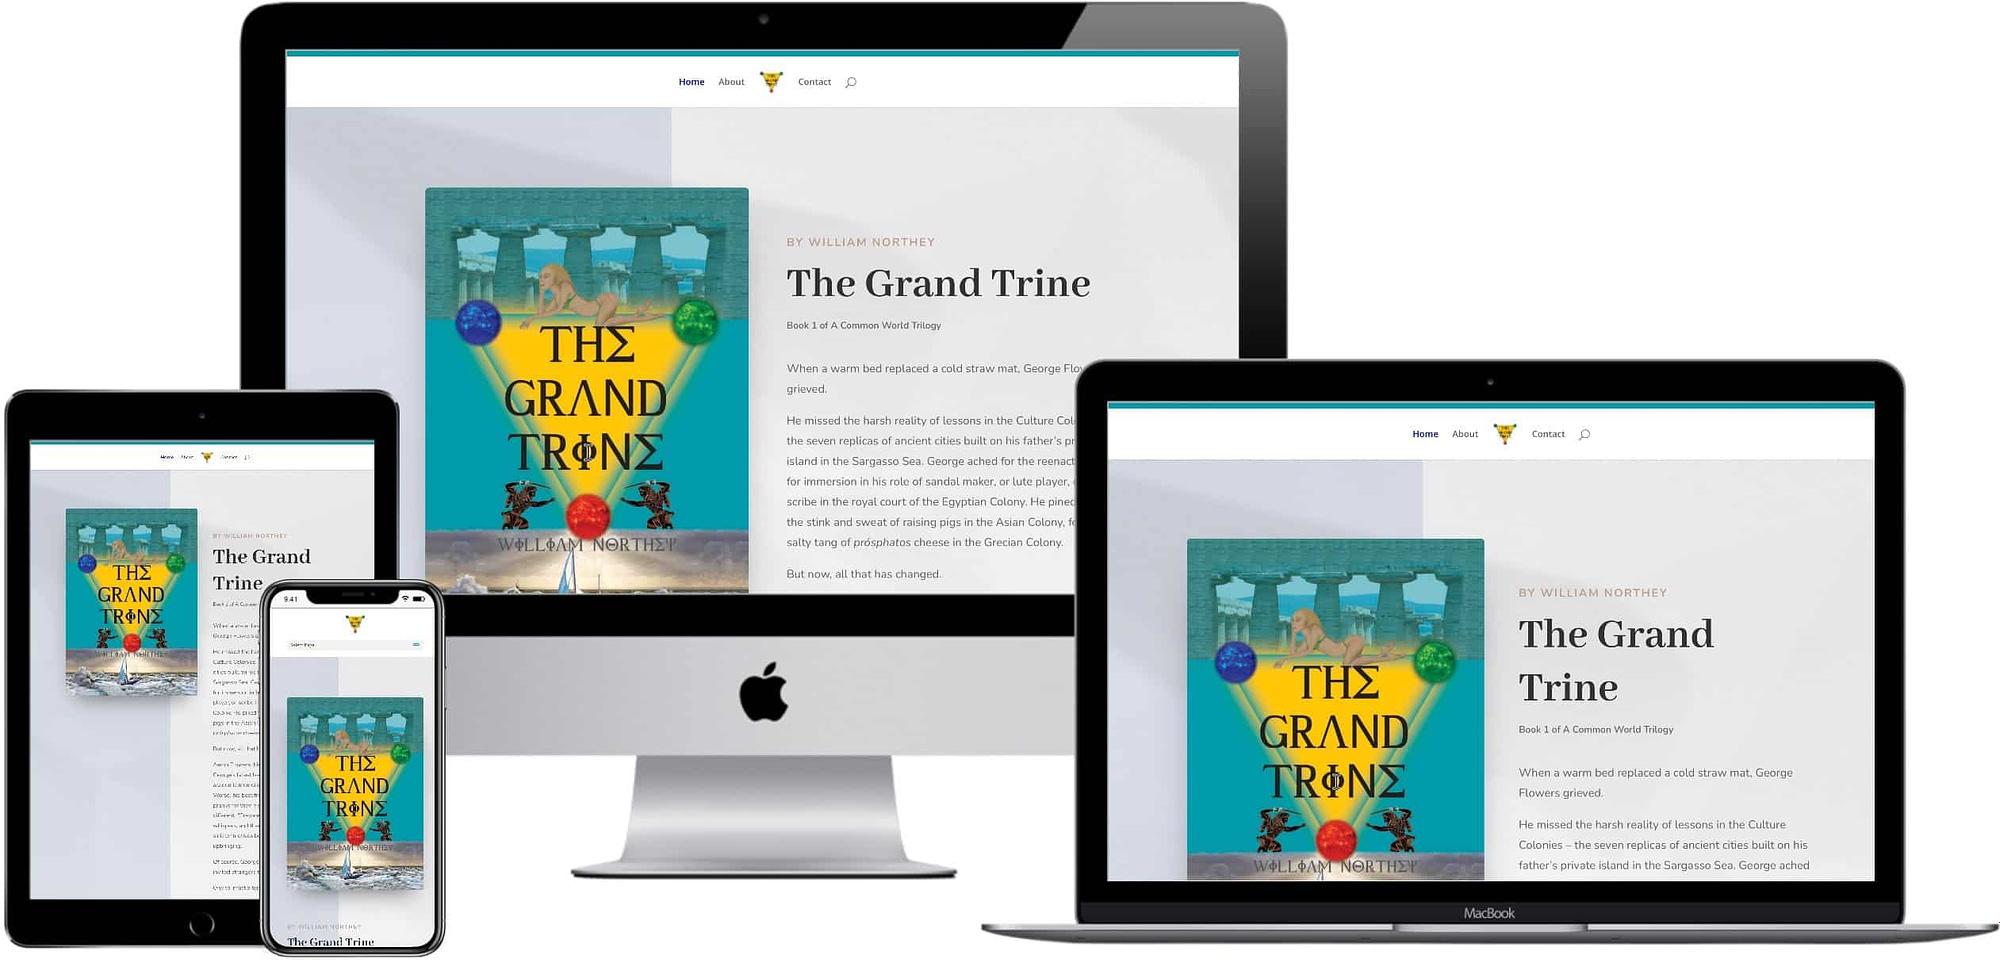 Responsive Web Design - The Grand Trine - William Northey